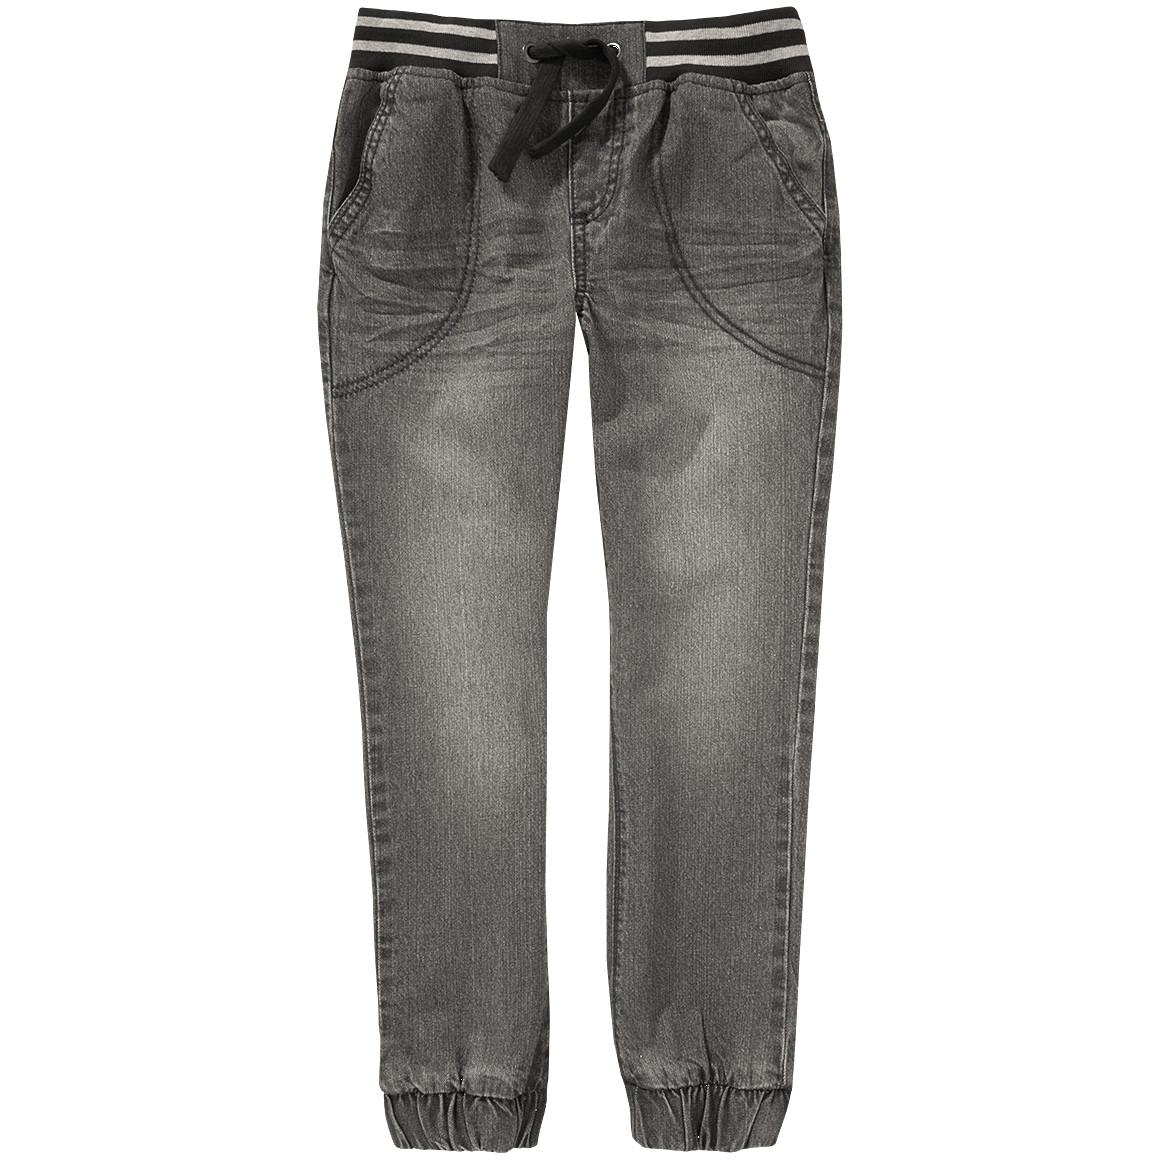 Boyshosen - Jungen Pull On Jeans mit Tunnelzug - Onlineshop Ernstings family